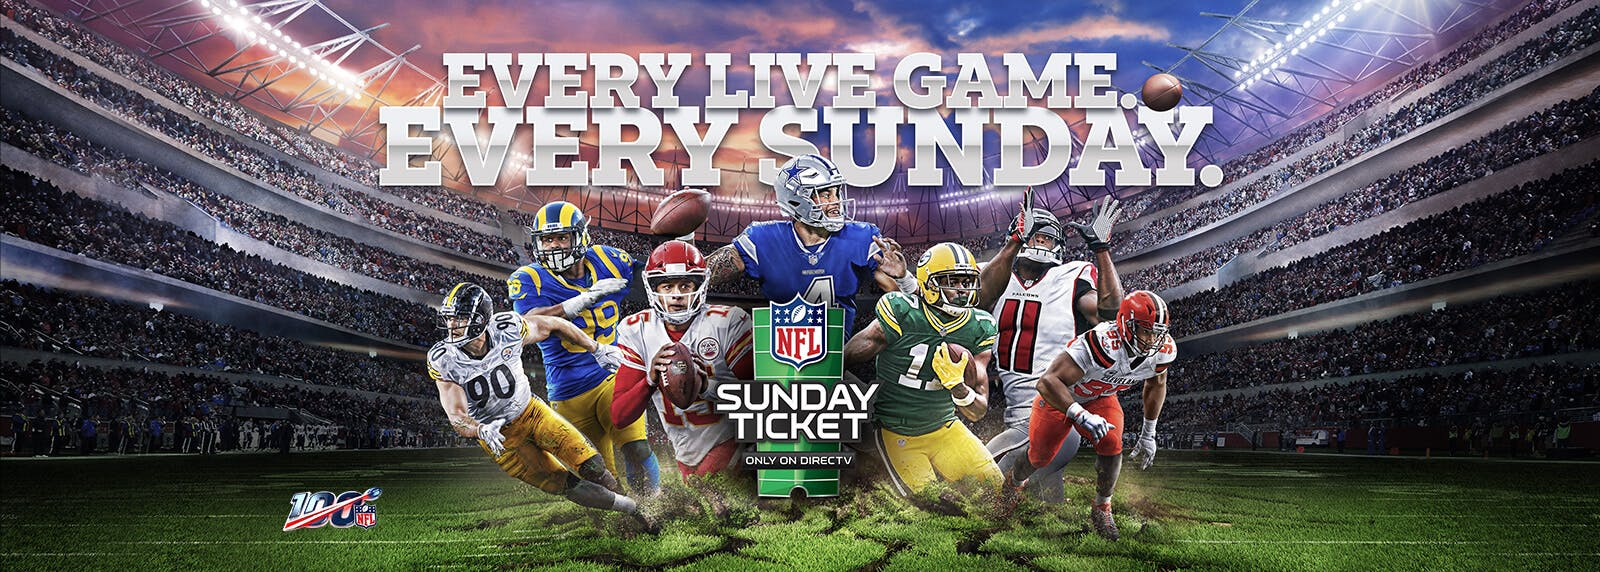 watch eagles vs vikings live stream nfl sunday ticket